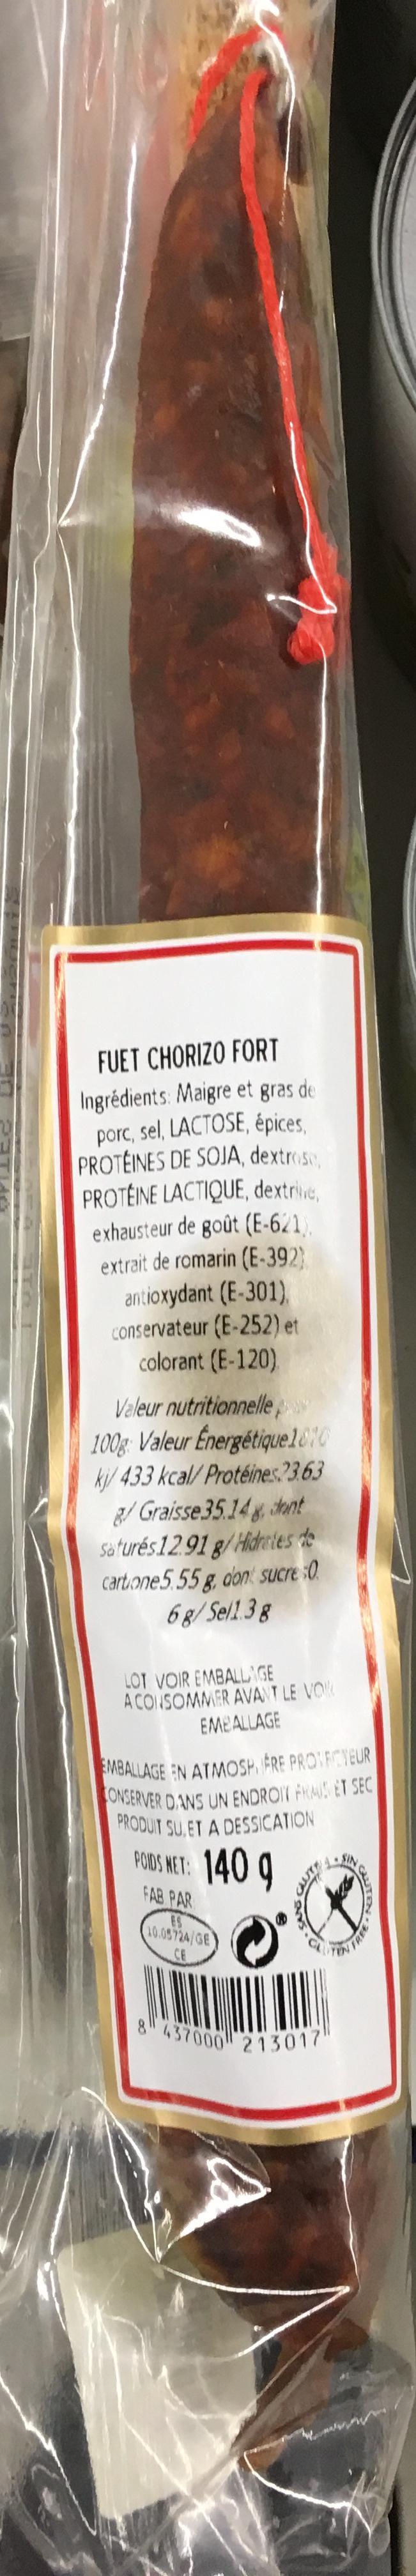 Fuet Chorizo fort - Produit - fr